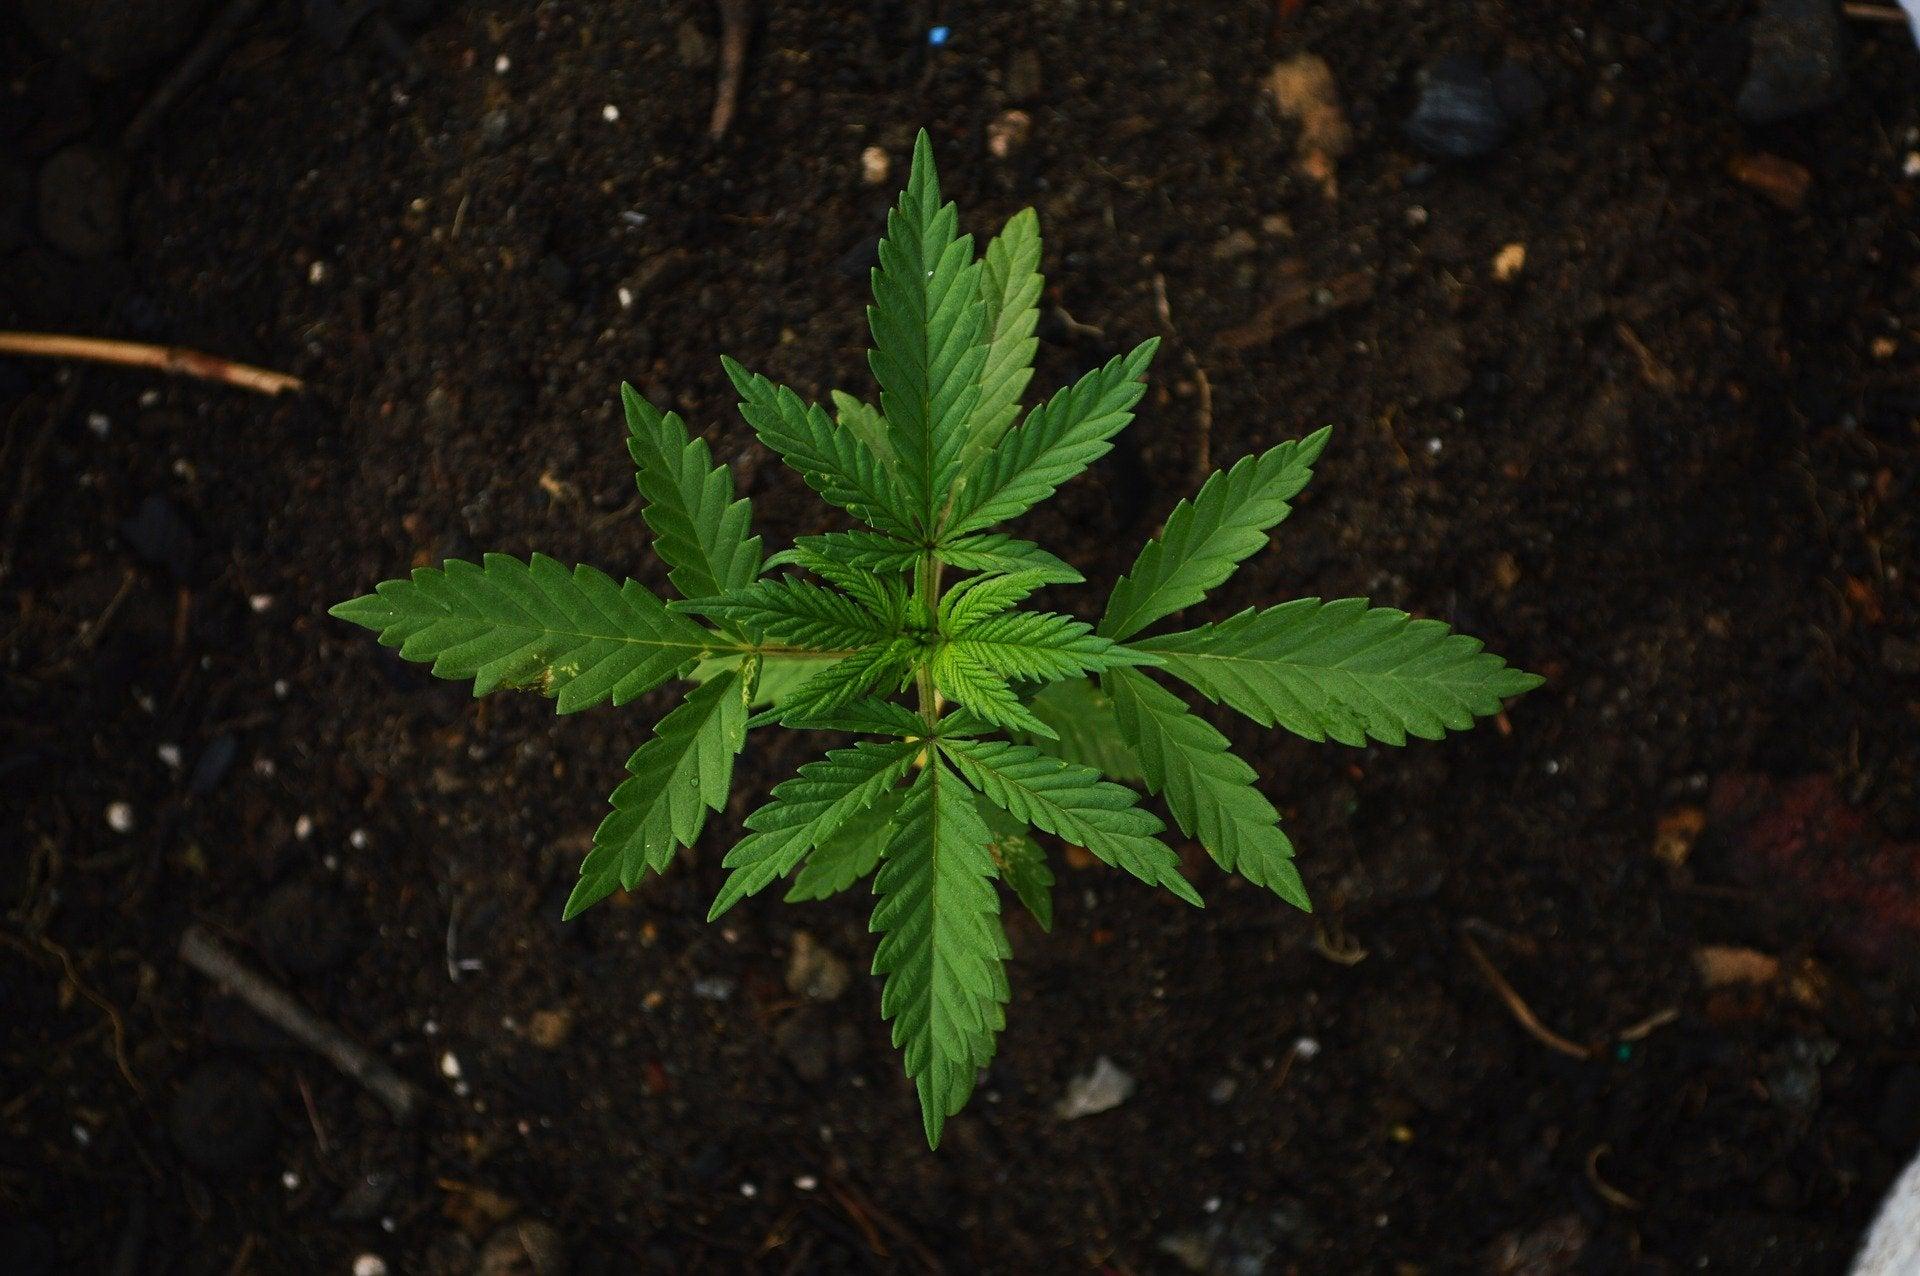 benzinga.com - Andrew Ward - Home Cannabis Cultivation Continues, Despite Opposition From Many Marijuana Companies